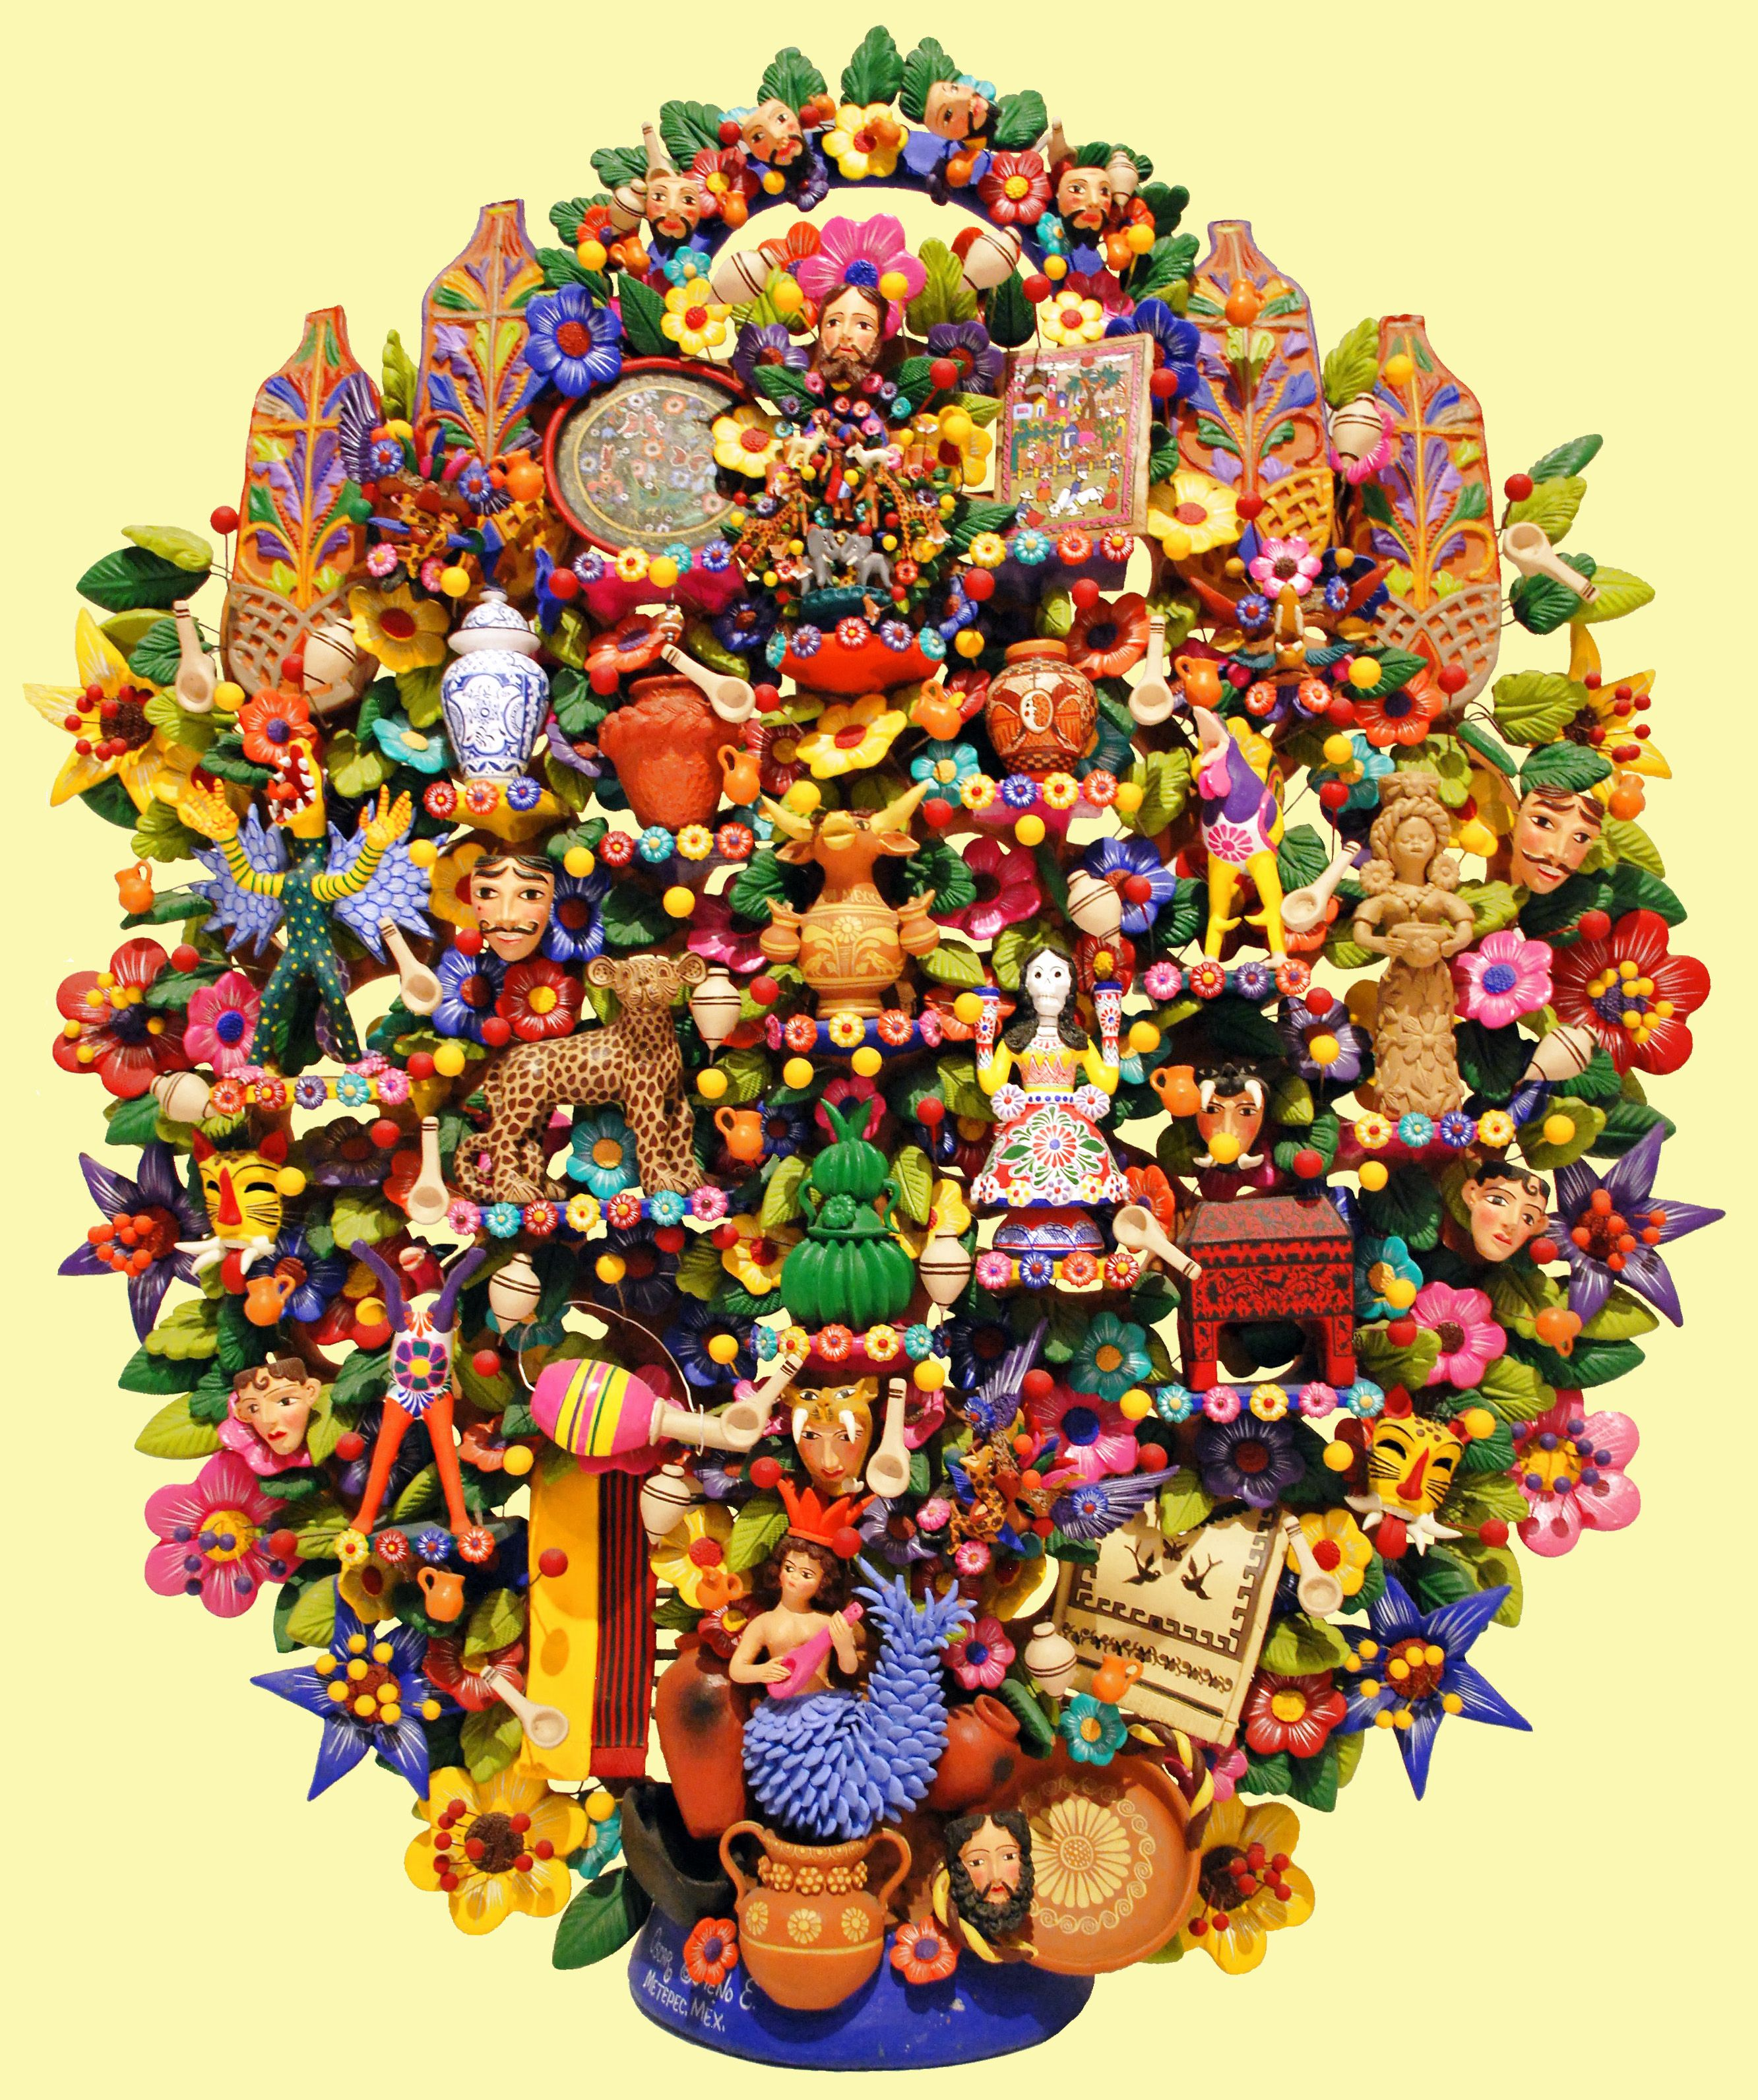 Artesanato Mexicano Comprar ~ Imagem de http  0pottery s3 amazonaws com metepec tree magni jpg ARTE, CULTURA, CULTURA POP